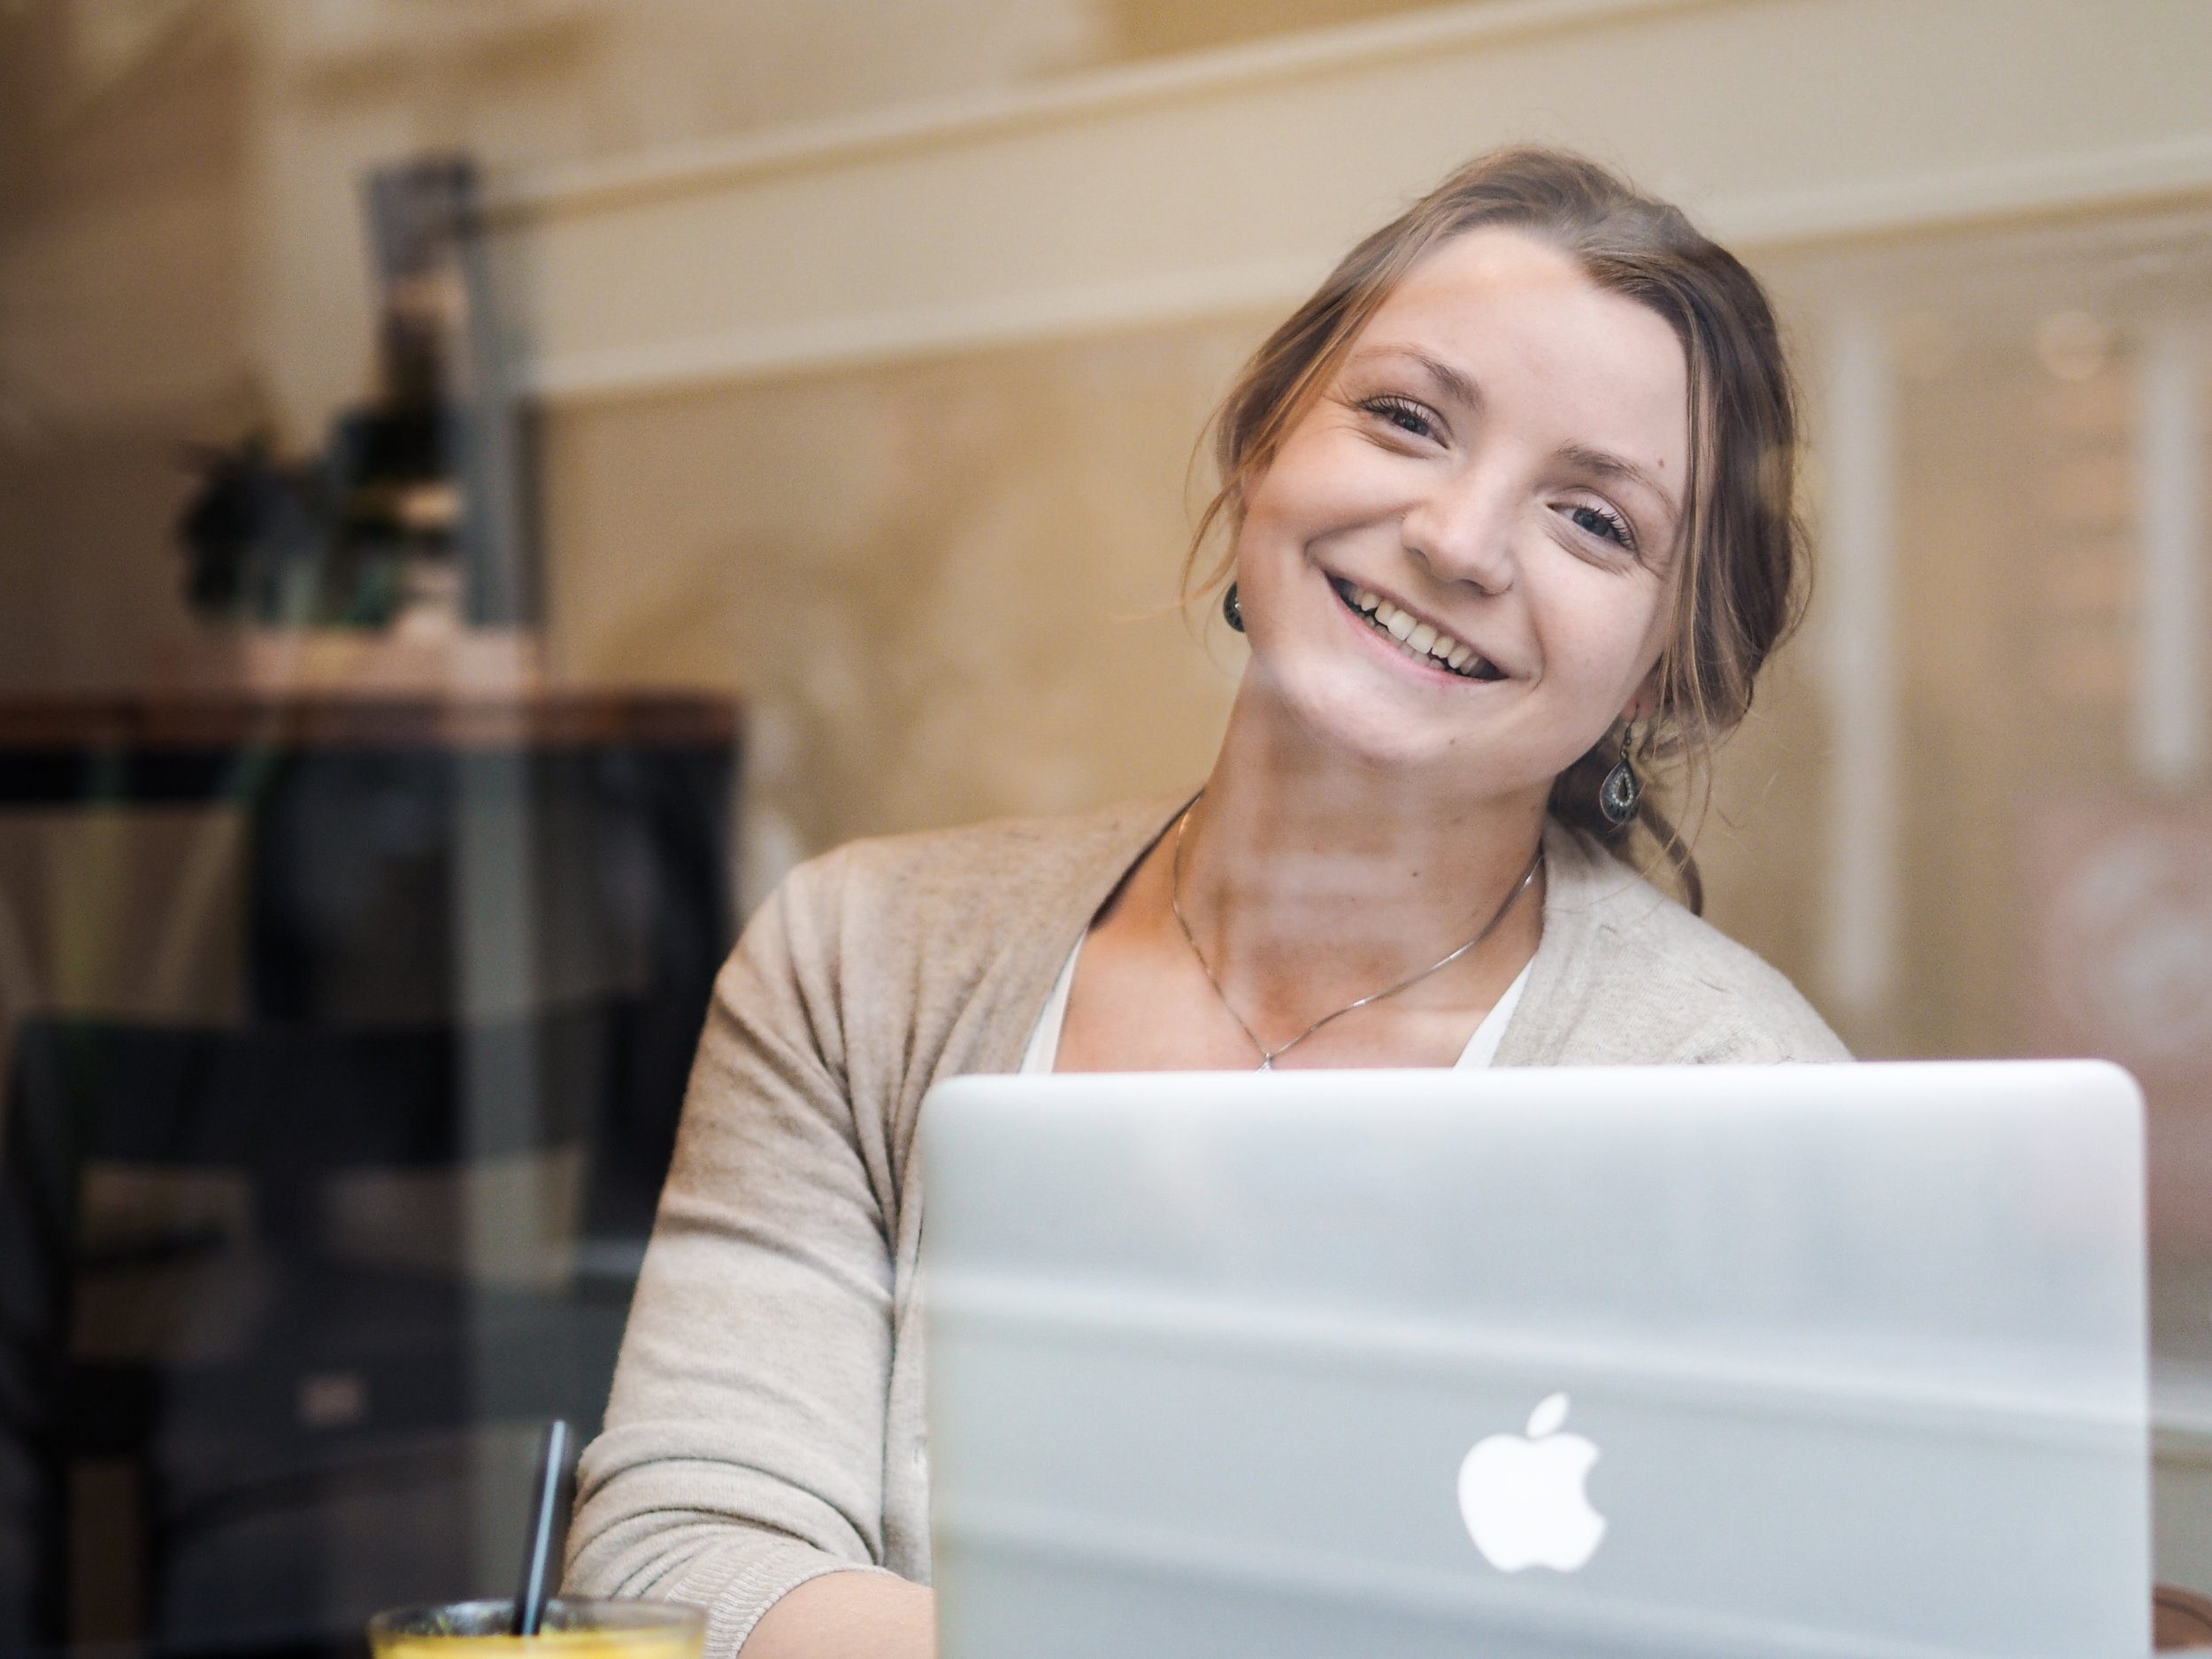 Rachel Hibma - Toegepaste Psycholoog & Orthomoleculair Voedingscoach bij Food Your Thought